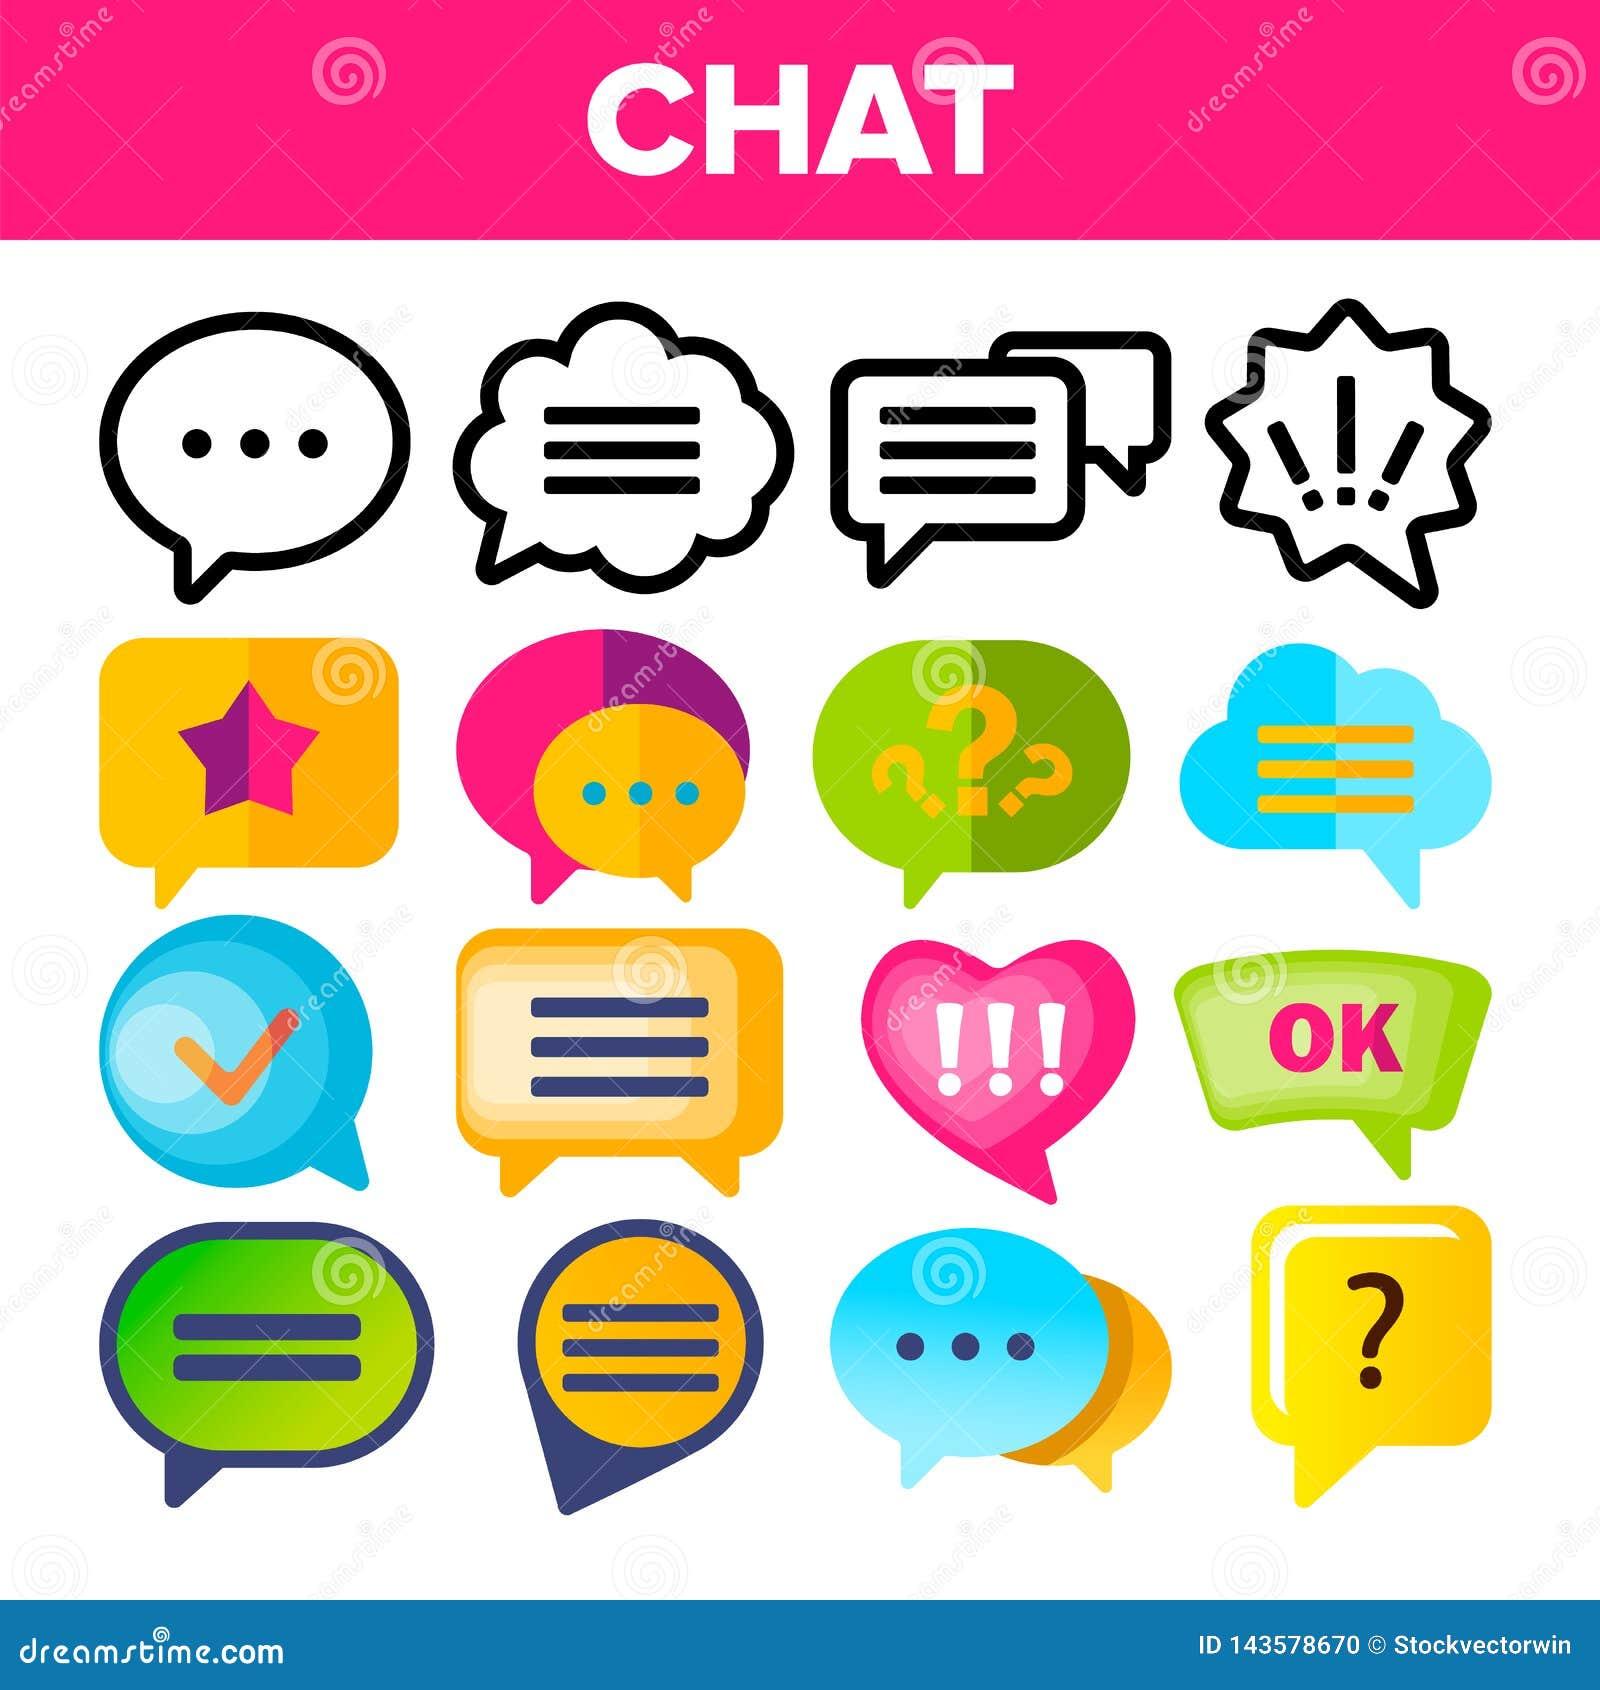 Speech Bubble Icon Set Vector  Chat Dialog Conversation